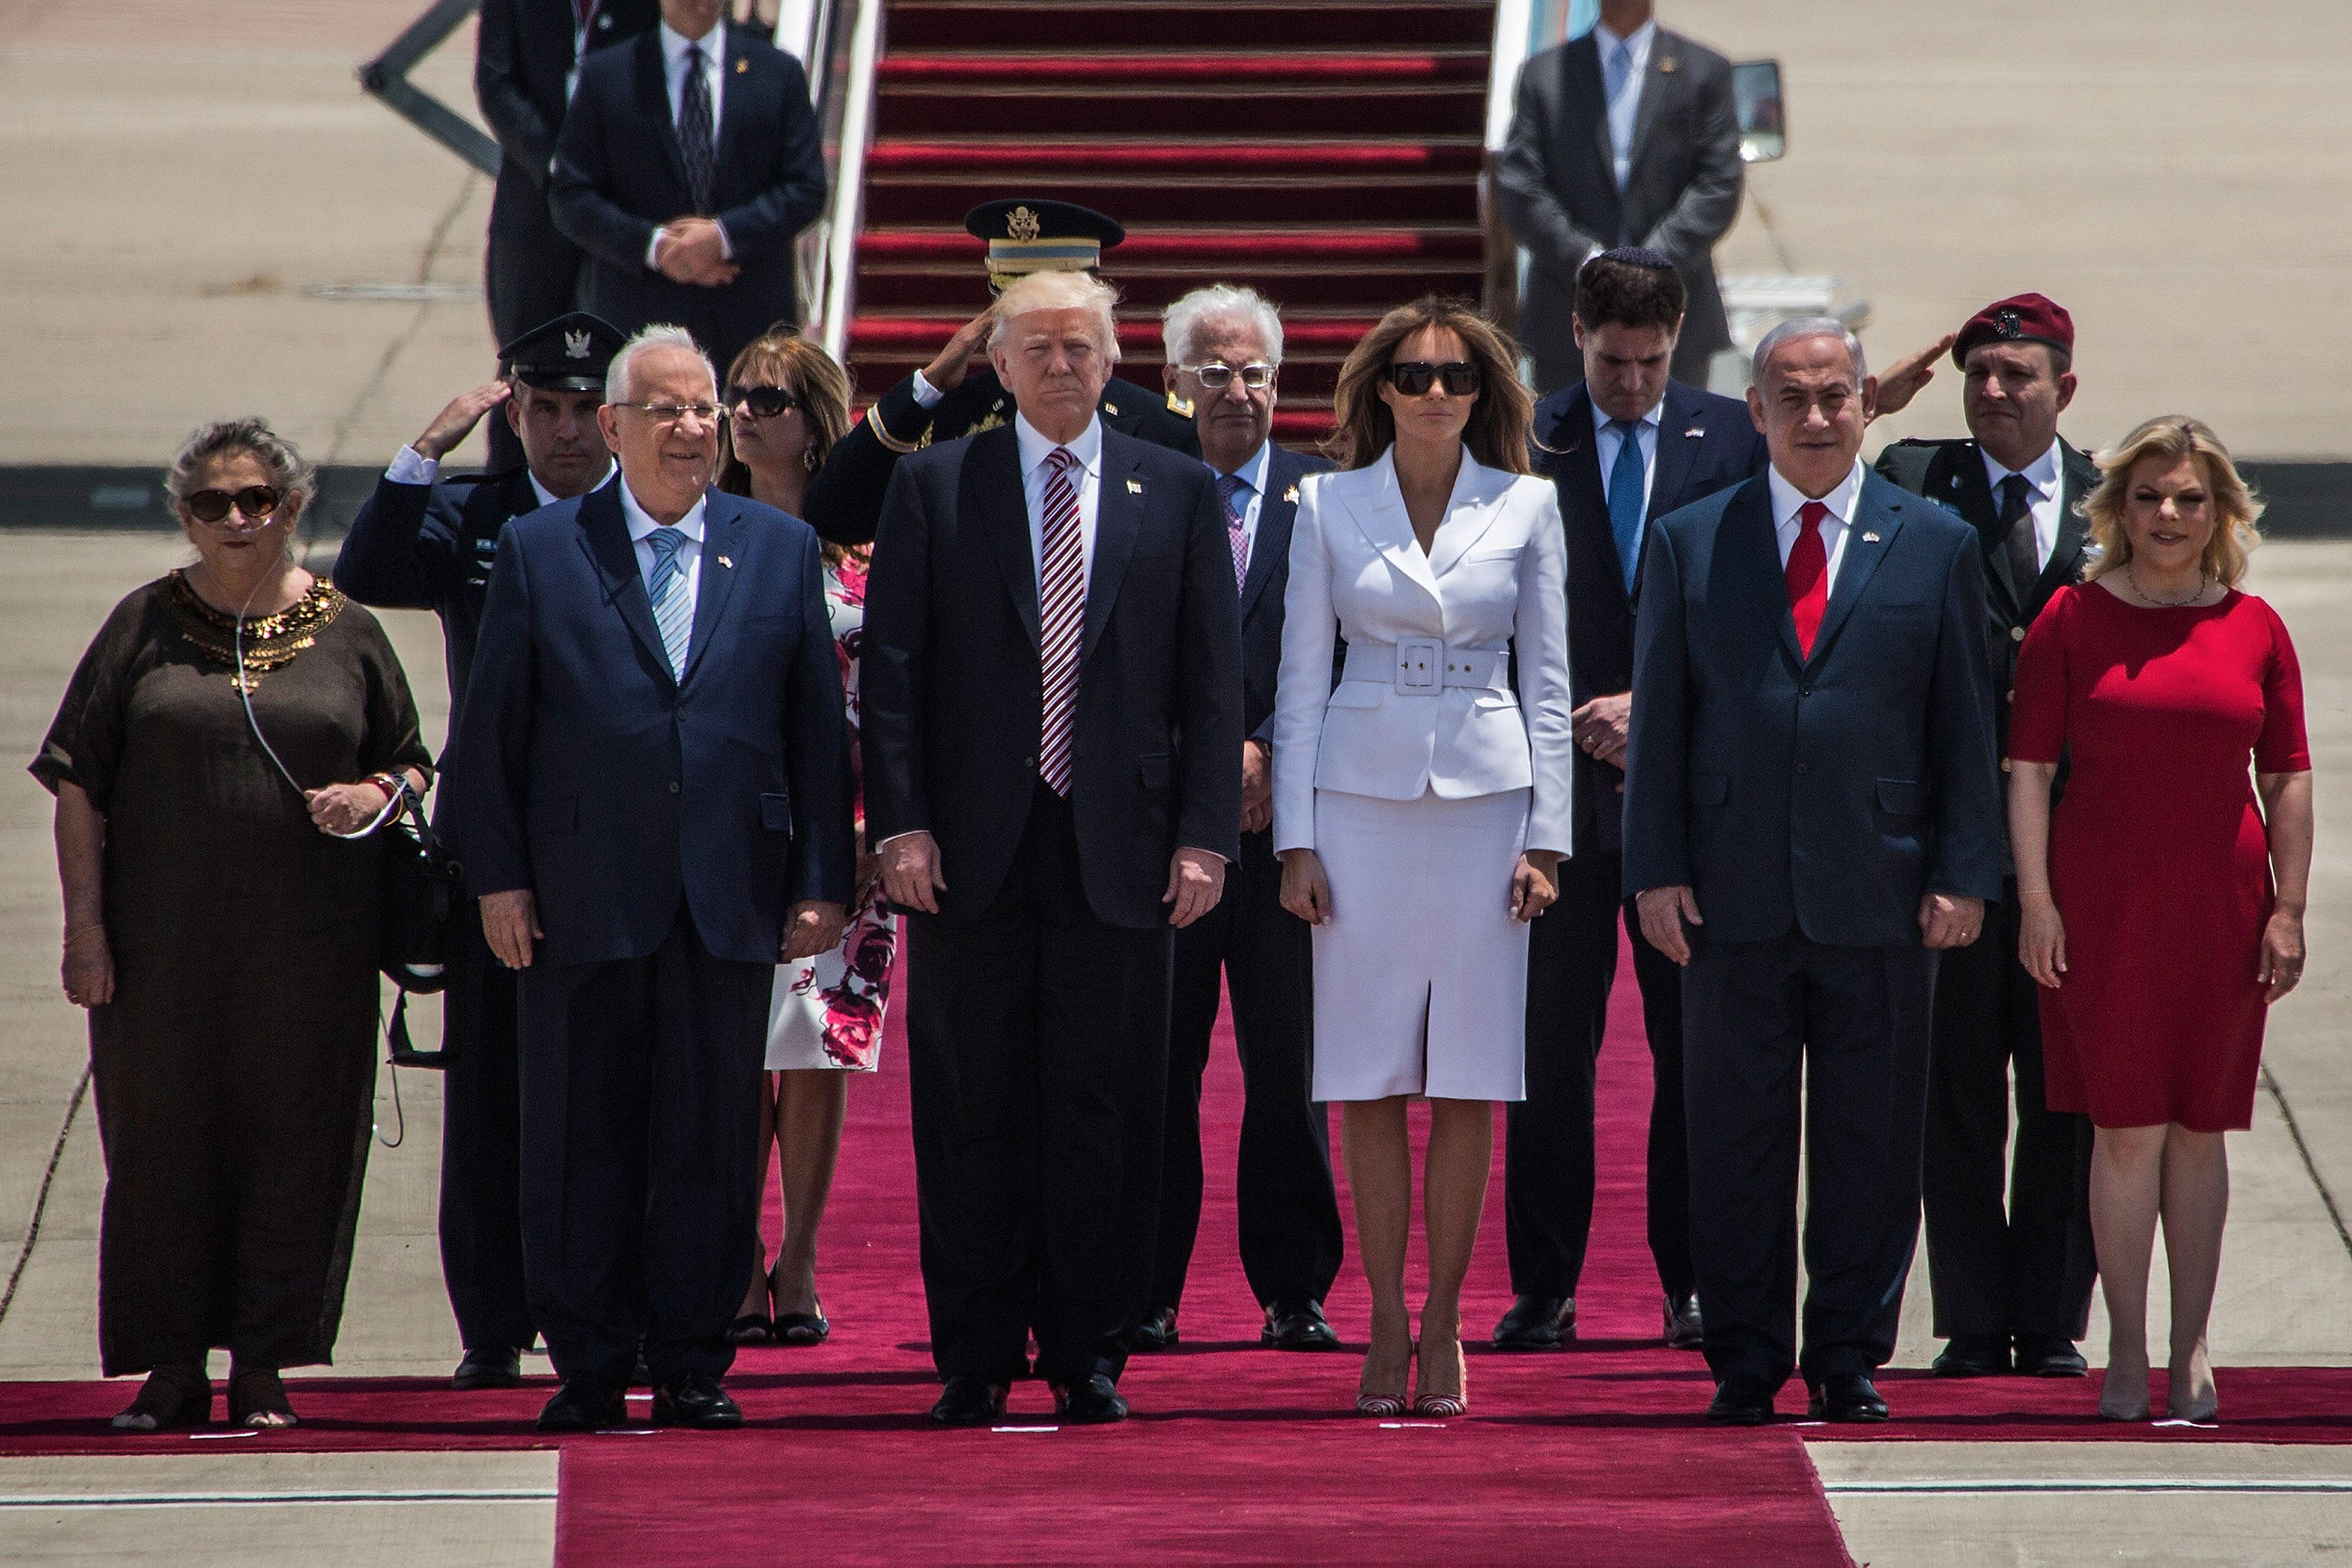 Donald Trump in Israel, May 22, 2017